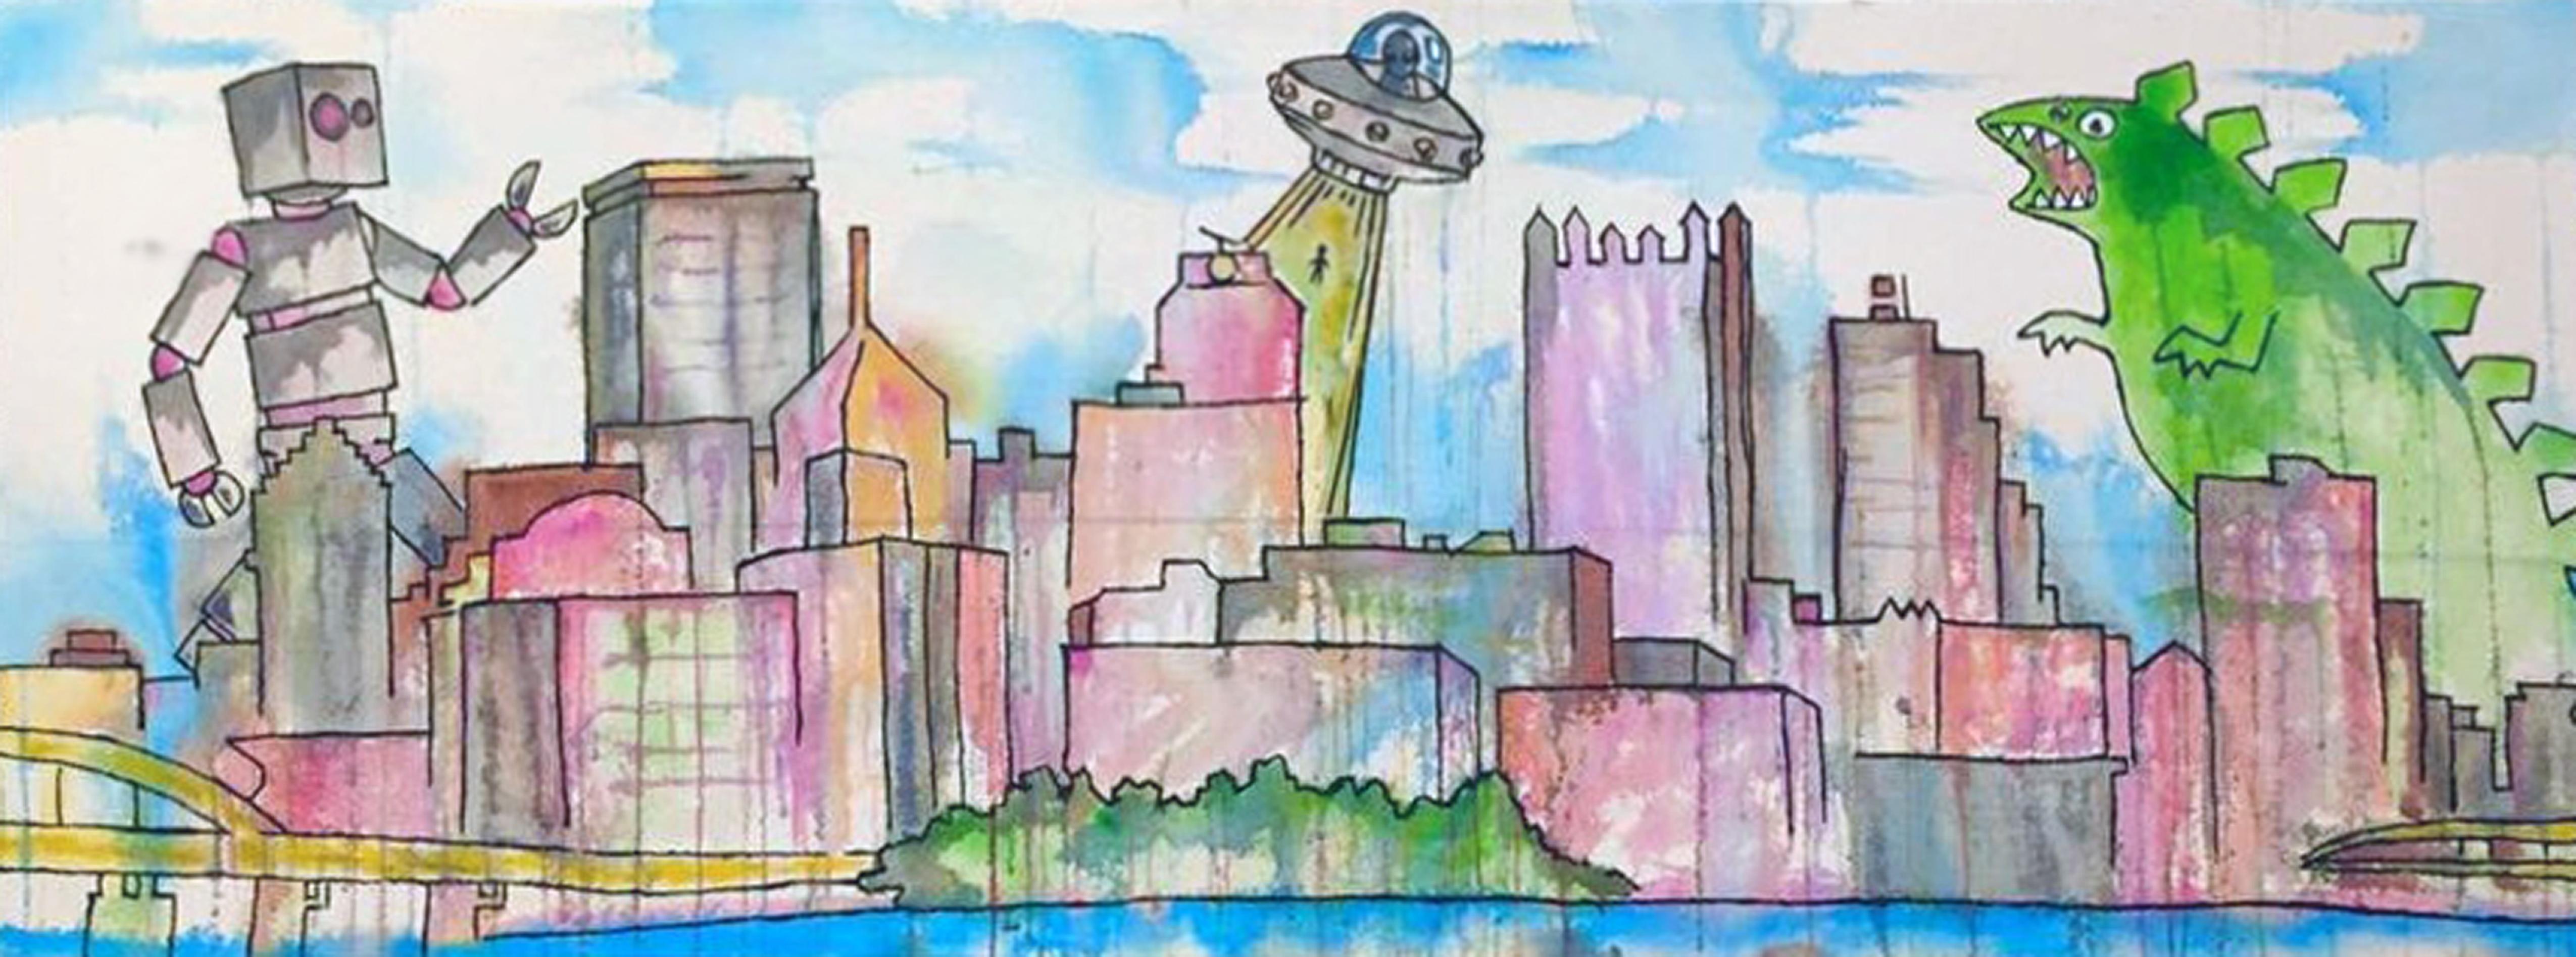 PittsburghDrip6_sold